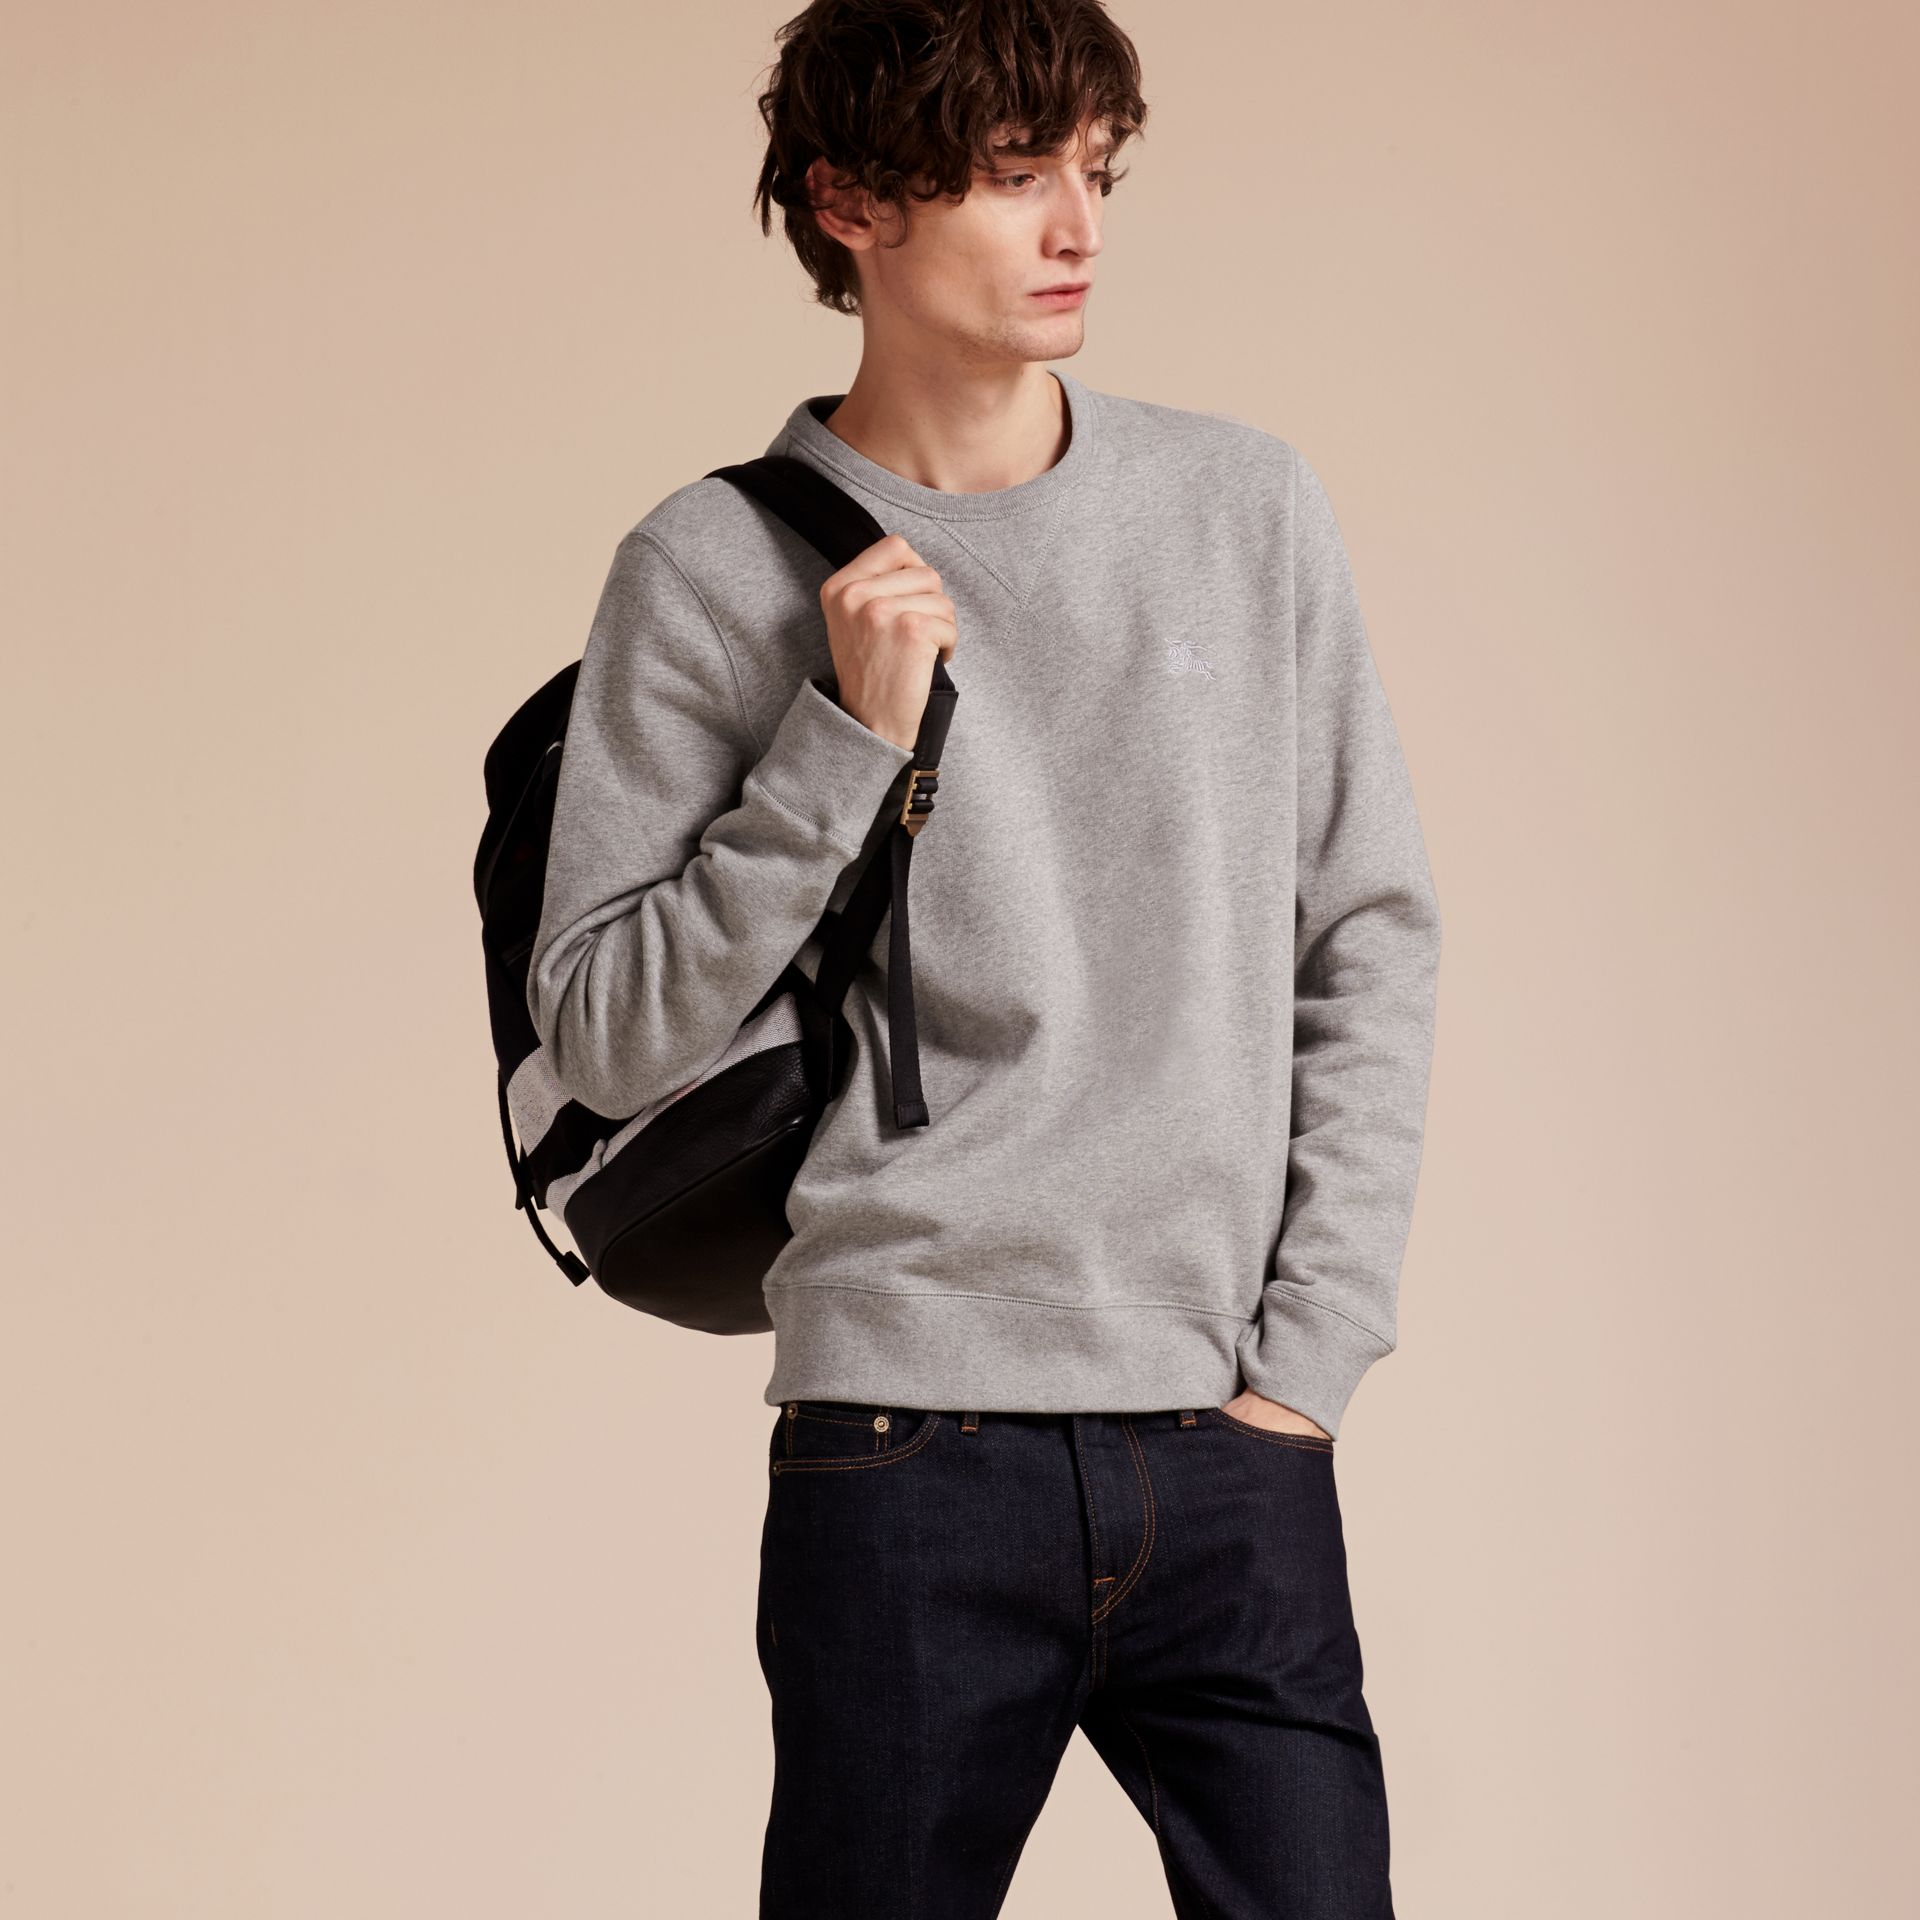 Cotton Blend Jersey Sweatshirt Pale Grey Melange - gallery image 6